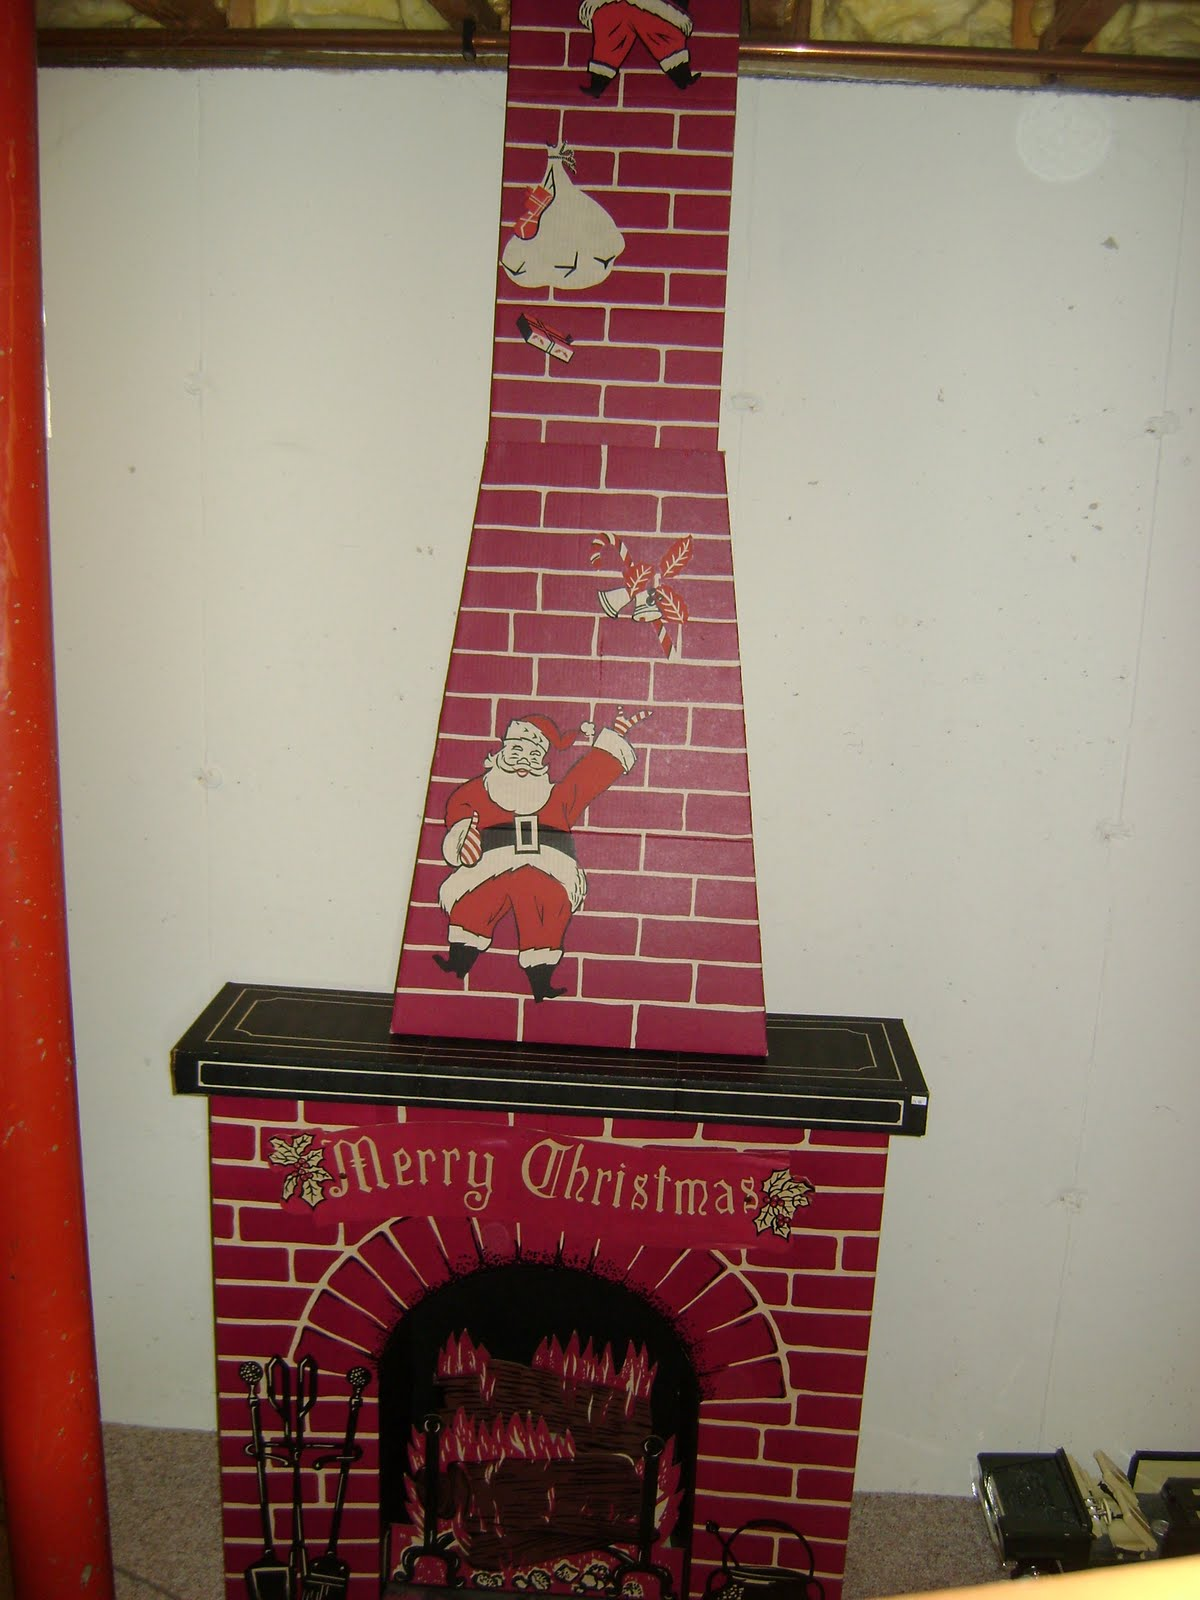 Cardboard Christmas Fireplace.Adventures In Ebay Vintage Tall Cardboard Christmas Fireplace